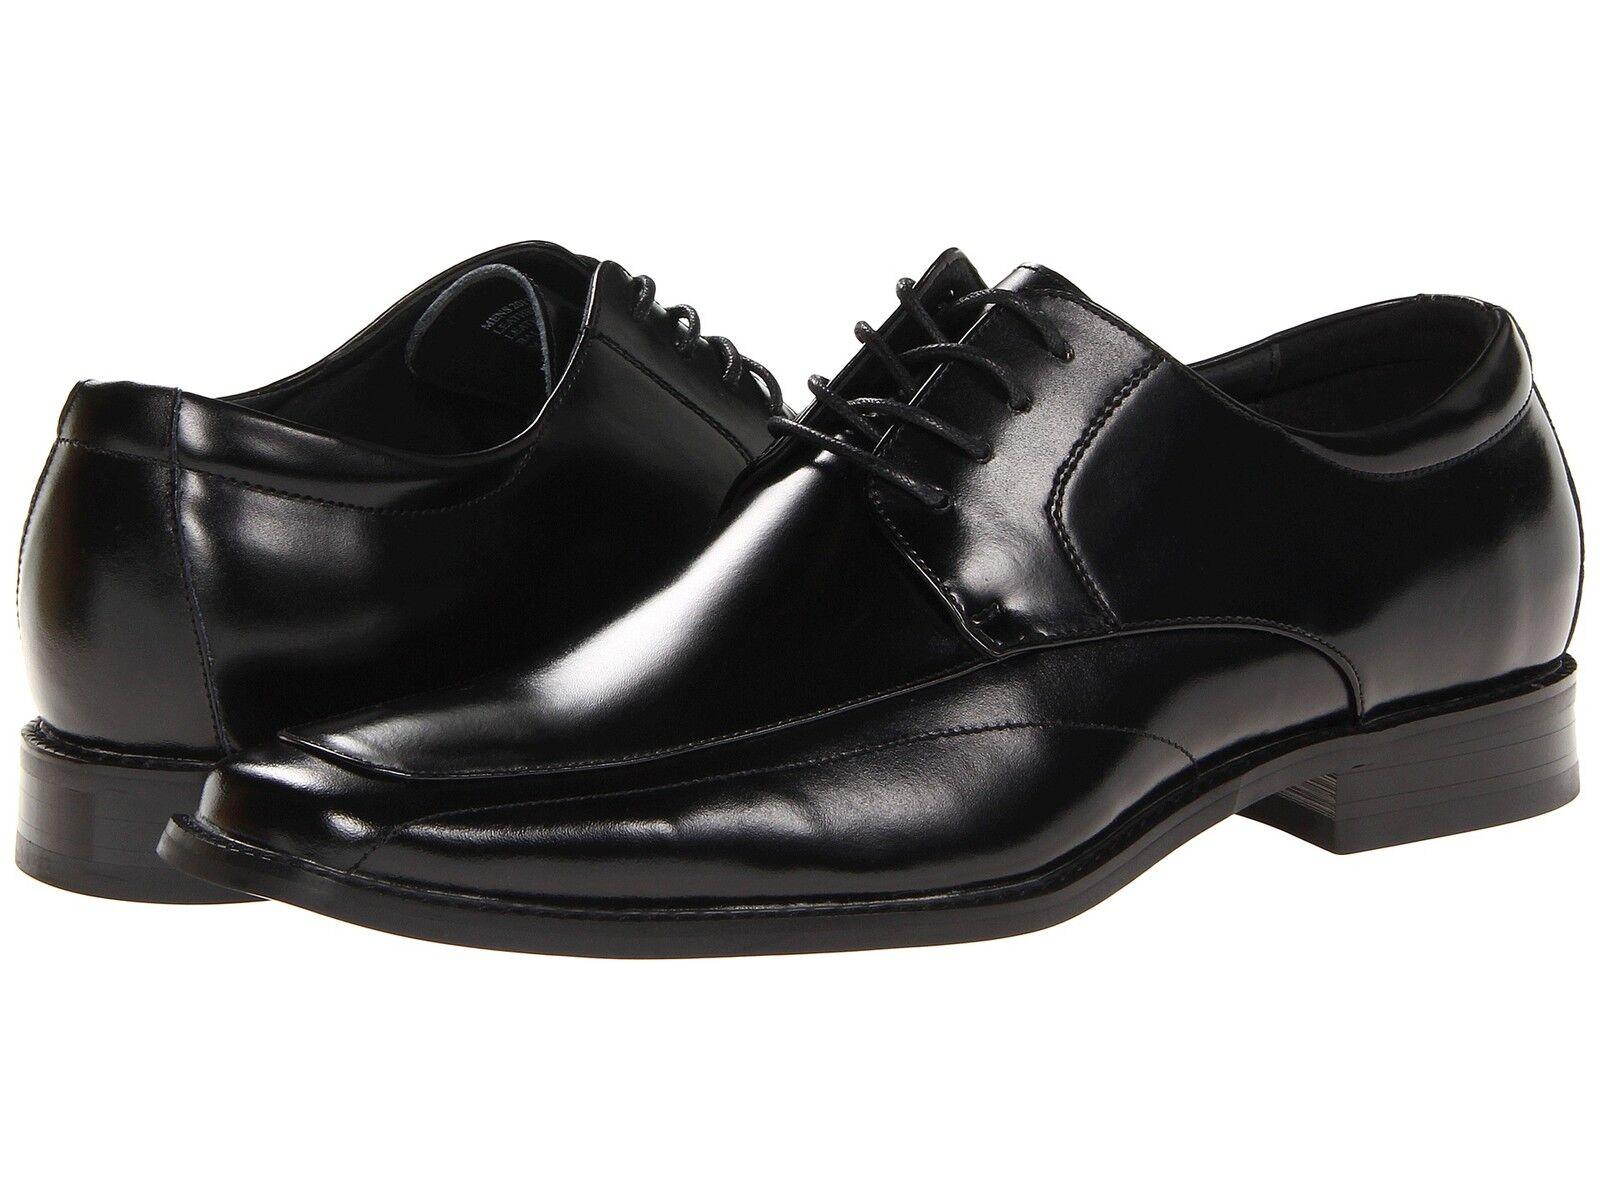 Zapatos Zapatos Zapatos de Cuero Stacy Adams Para hombre Drake Encaje-Ups Negro 20130-001 a3f52b